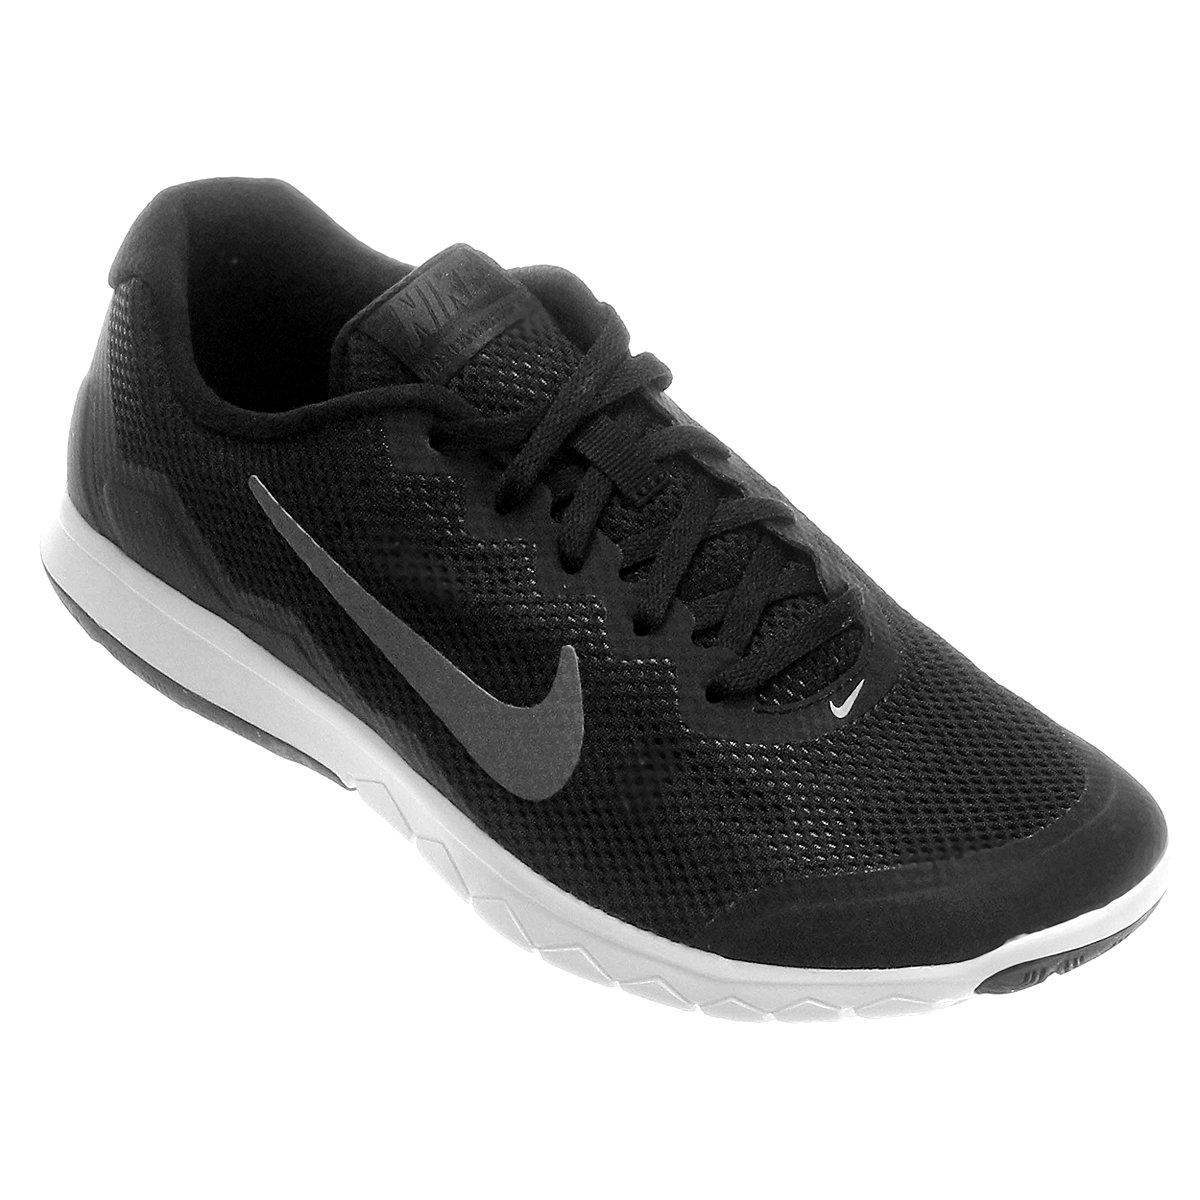 c50a36e59a4 Tênis Nike Flex Experience RN 4 Masculino - Compre Agora